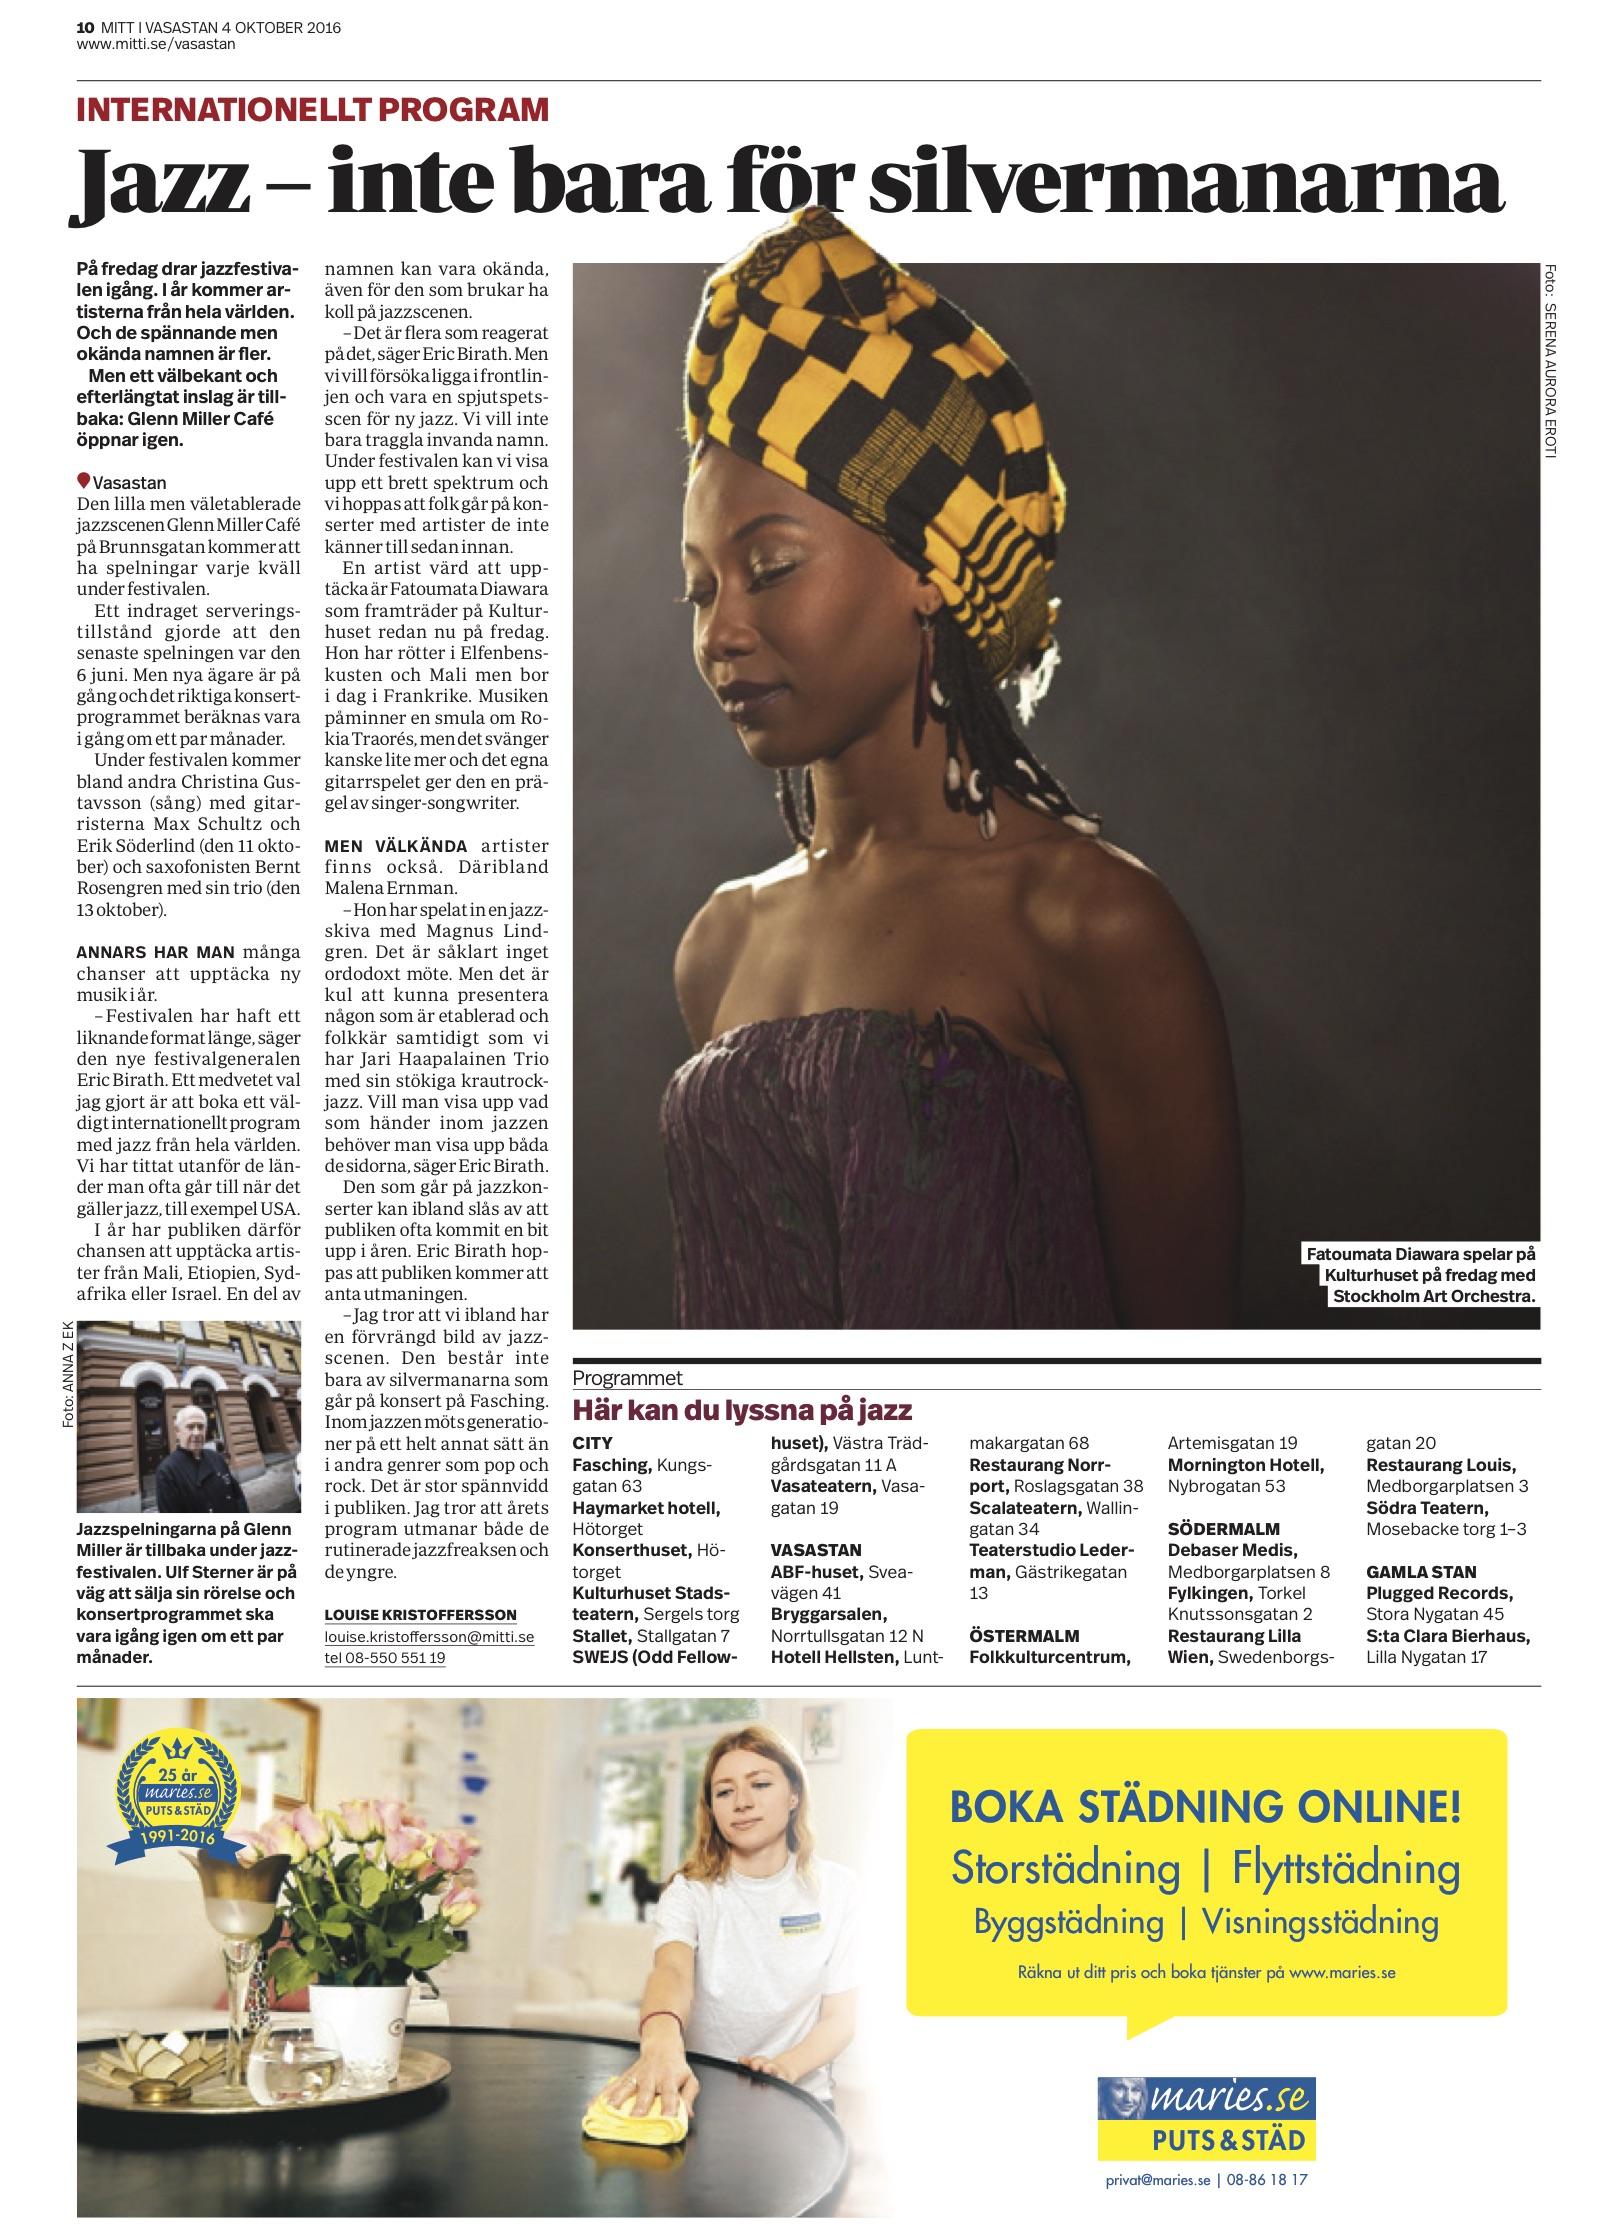 Mitt i Stockholm - intervju .jpg